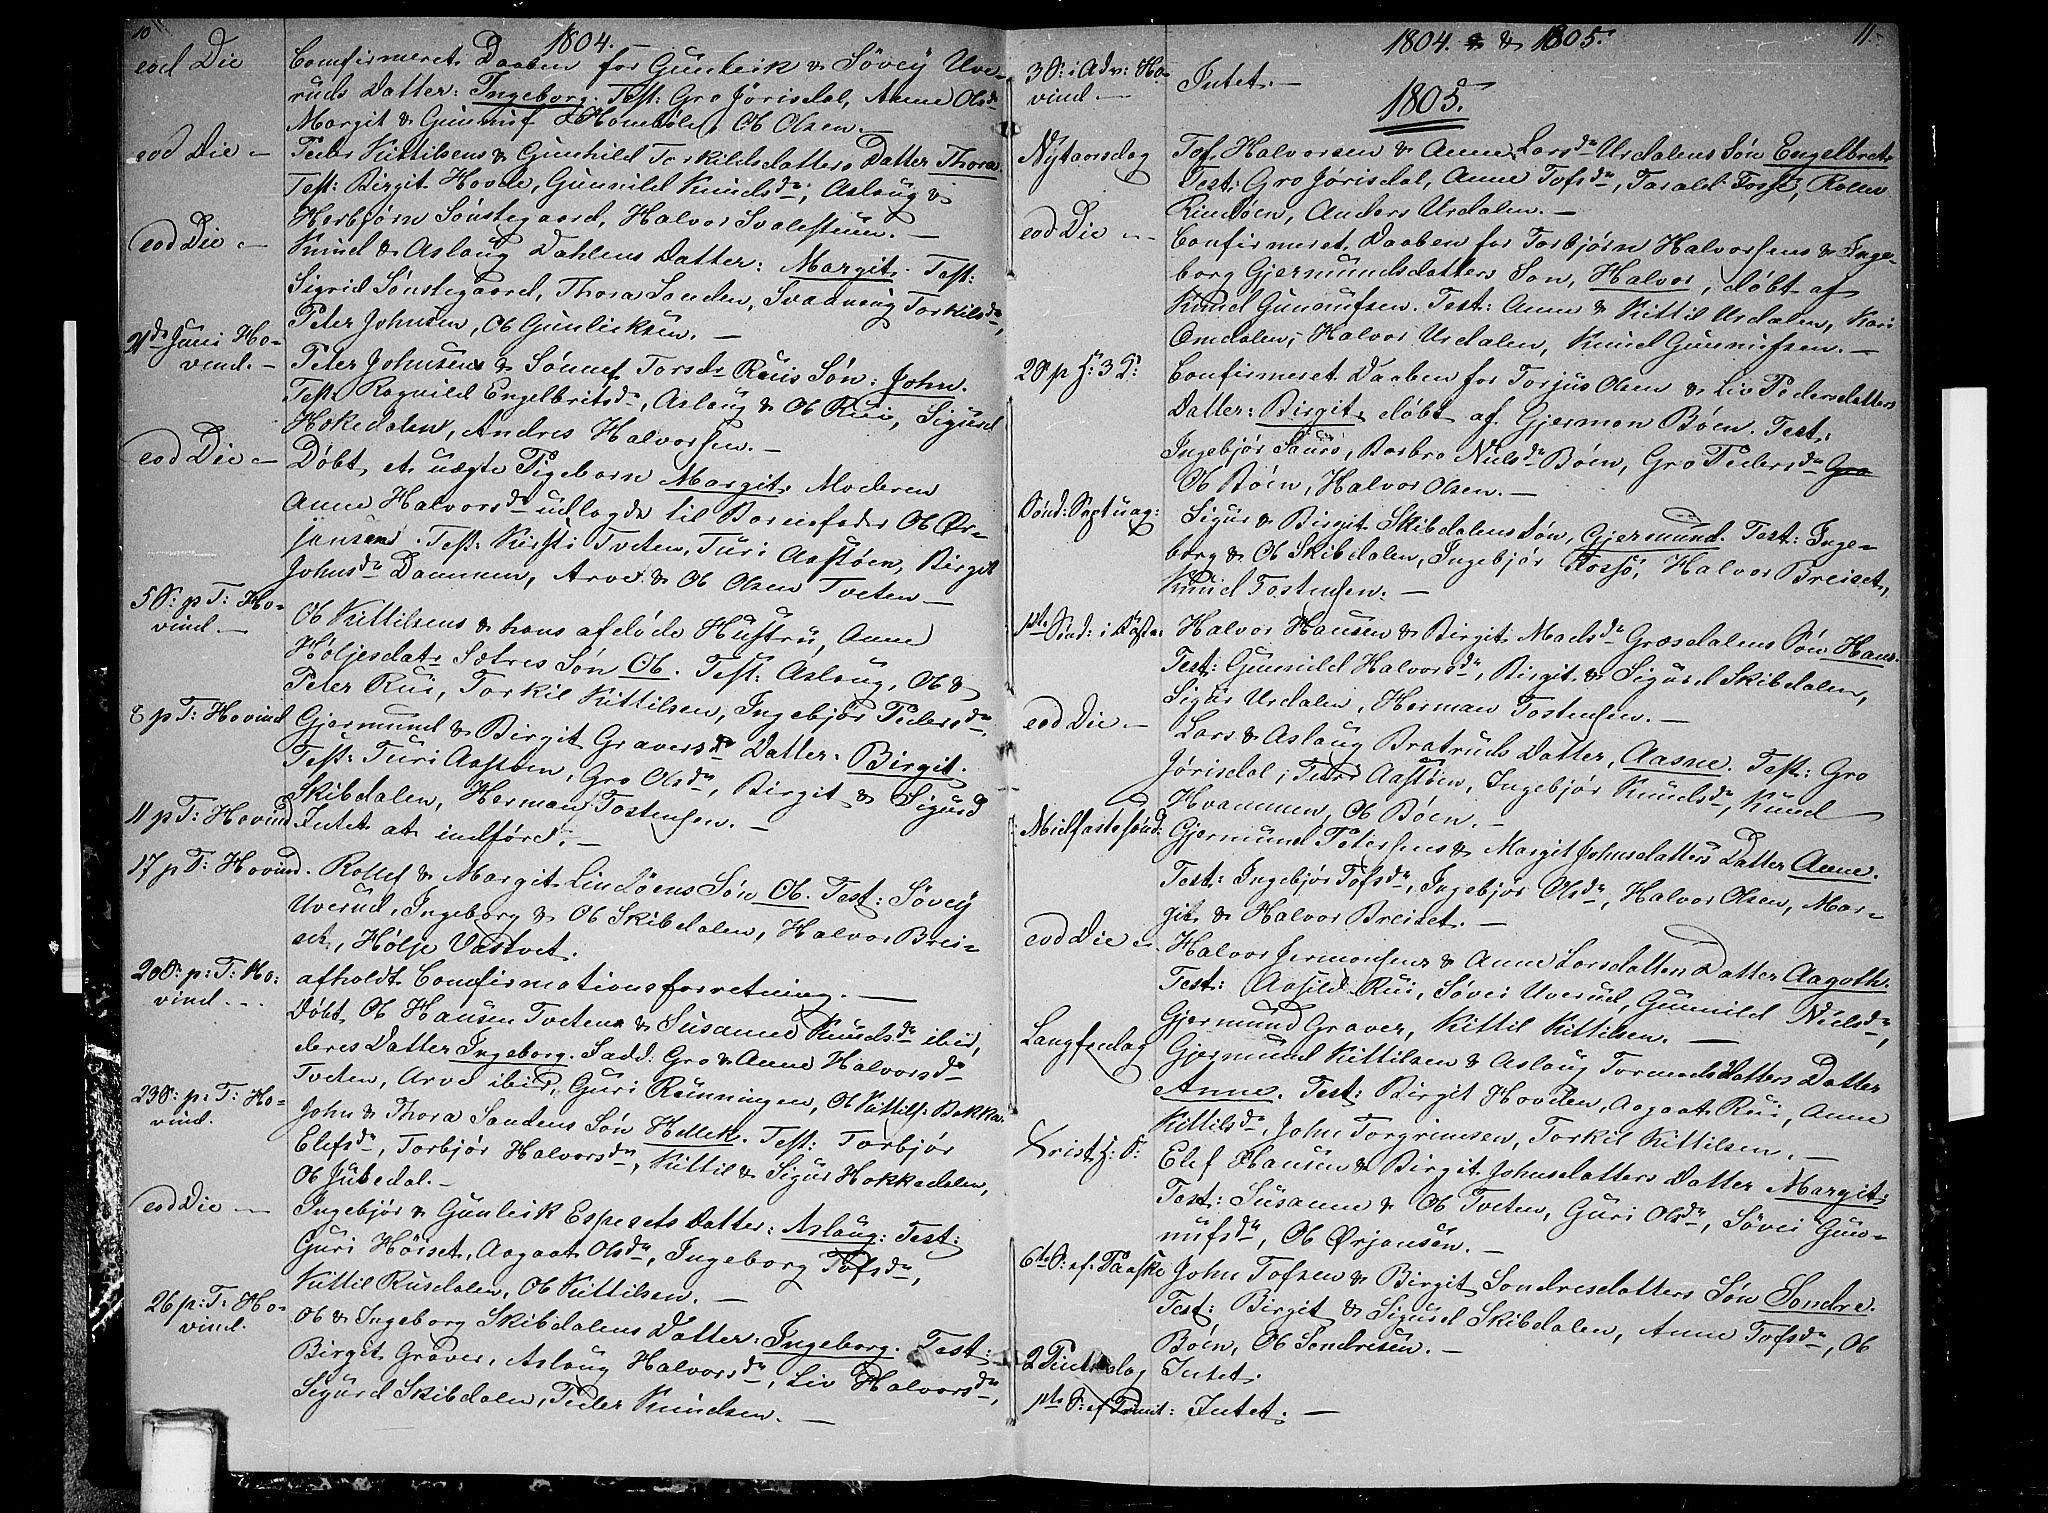 SAKO, Gransherad kirkebøker, F/Fb/L0001: Ministerialbok nr. II 1, 1800-1814, s. 10-11